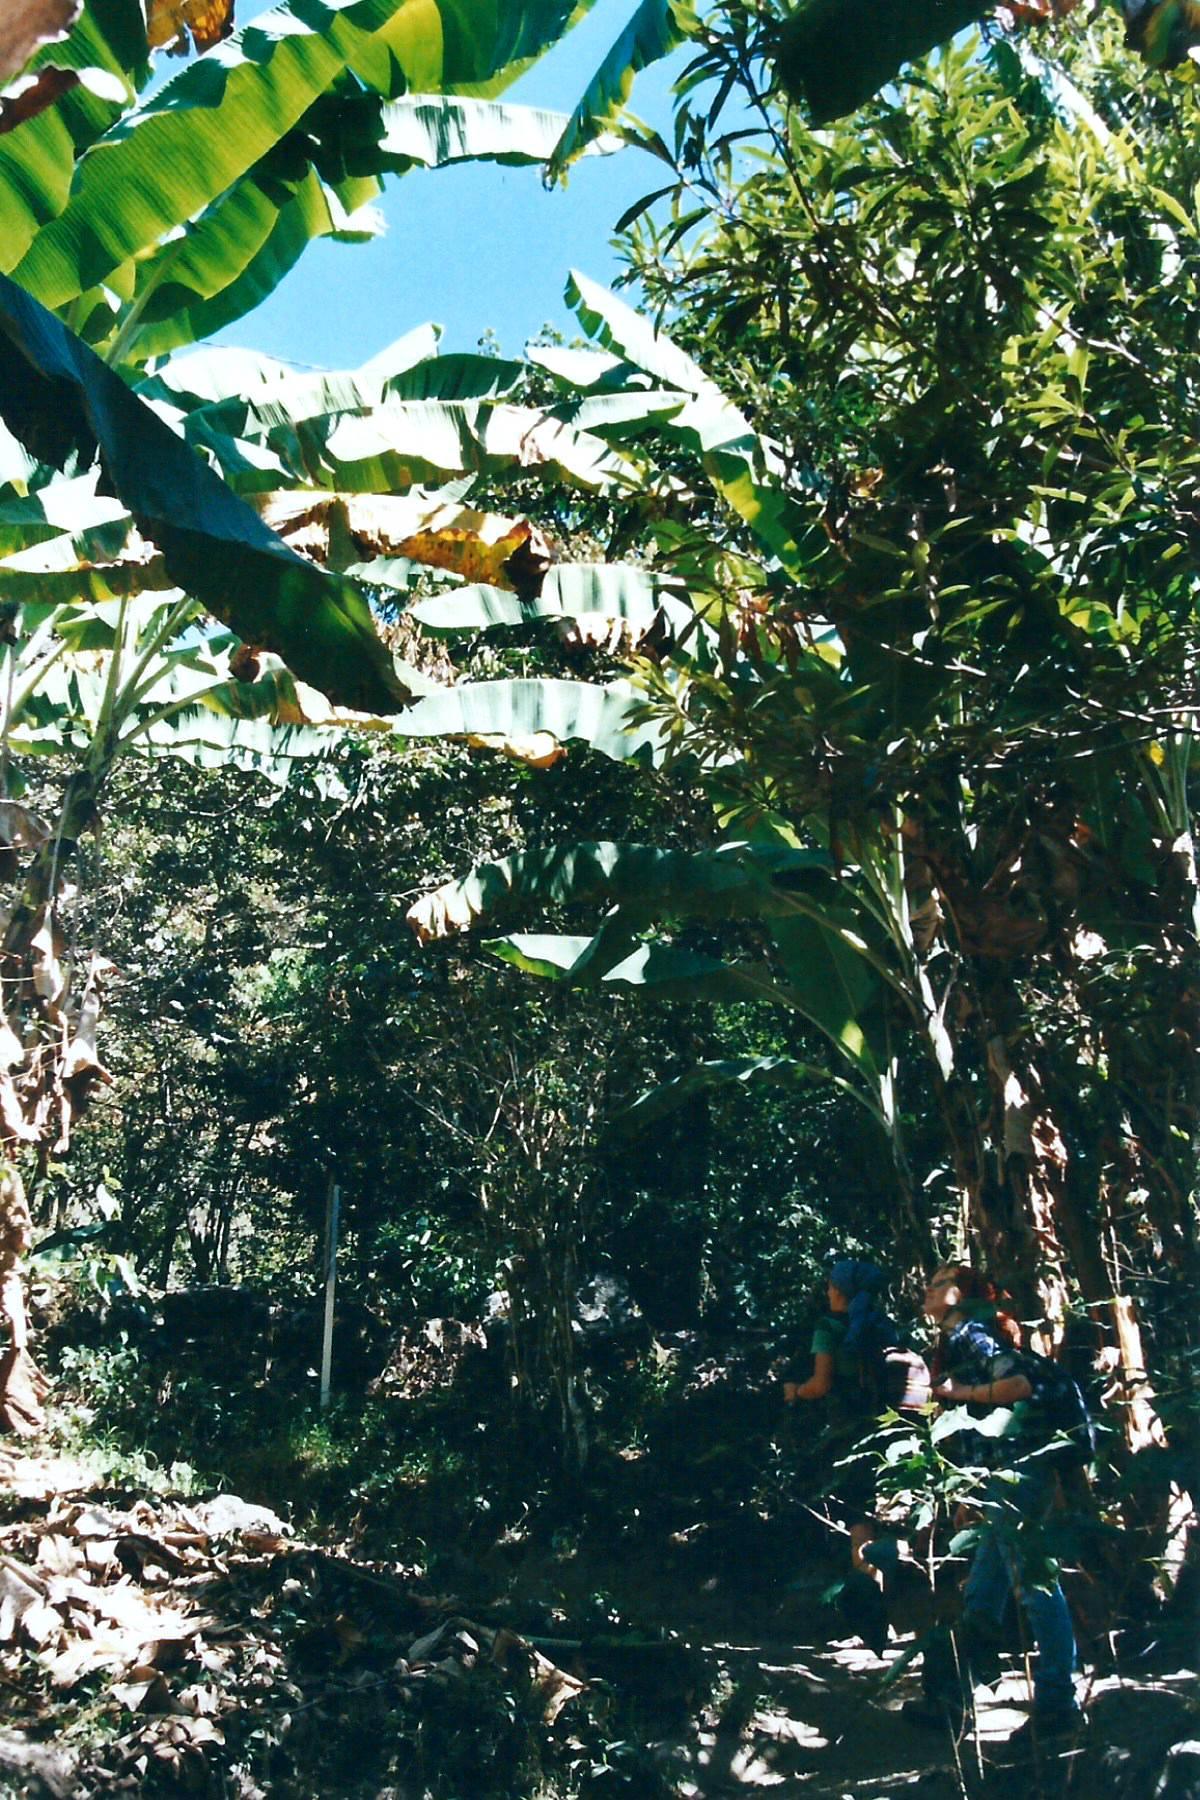 Üppige Vegetation auf dem Weg zum Machu Picchu